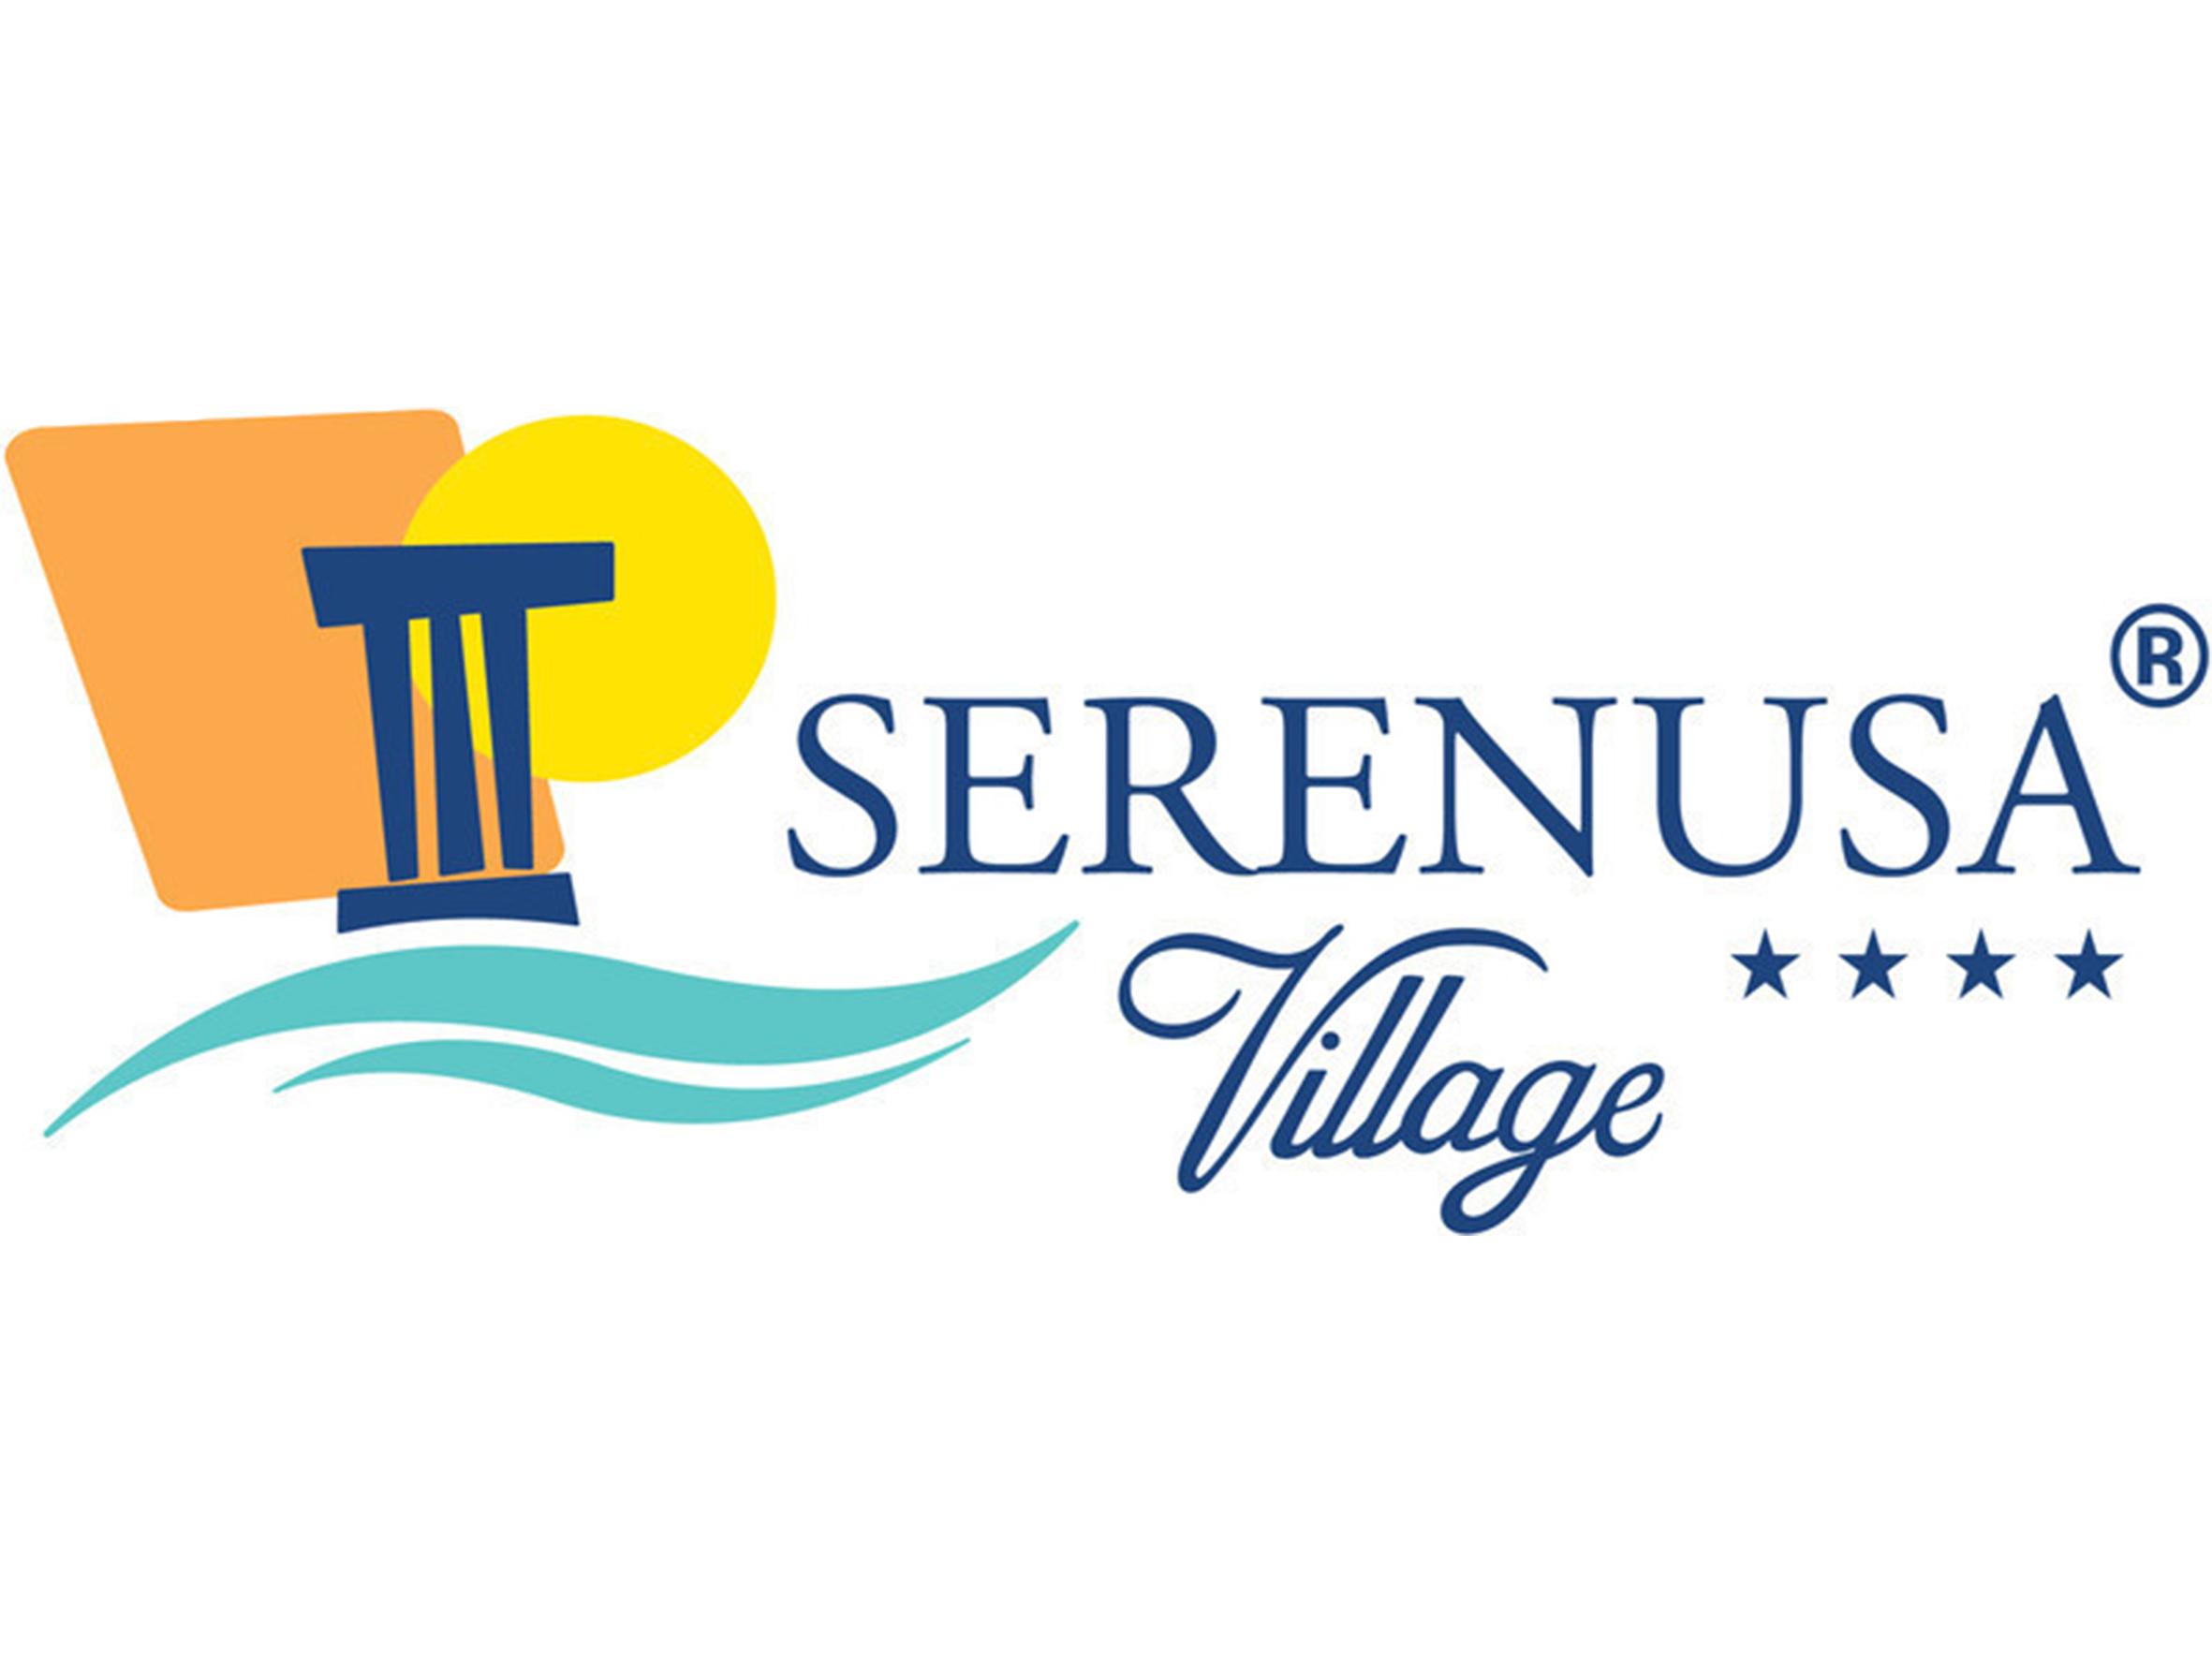 Serenusa Village - Speciale 2 Giugno Image